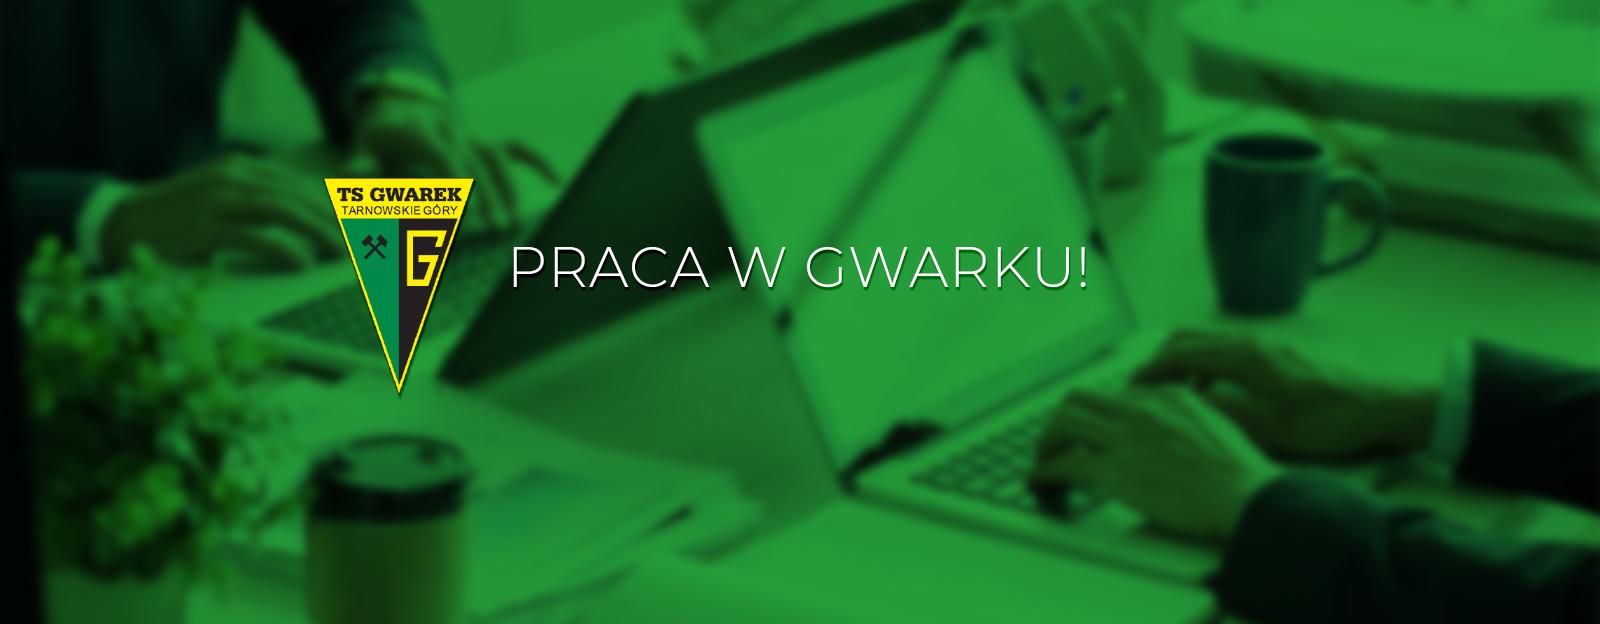 Praca w sekretariacie TS Gwarek!